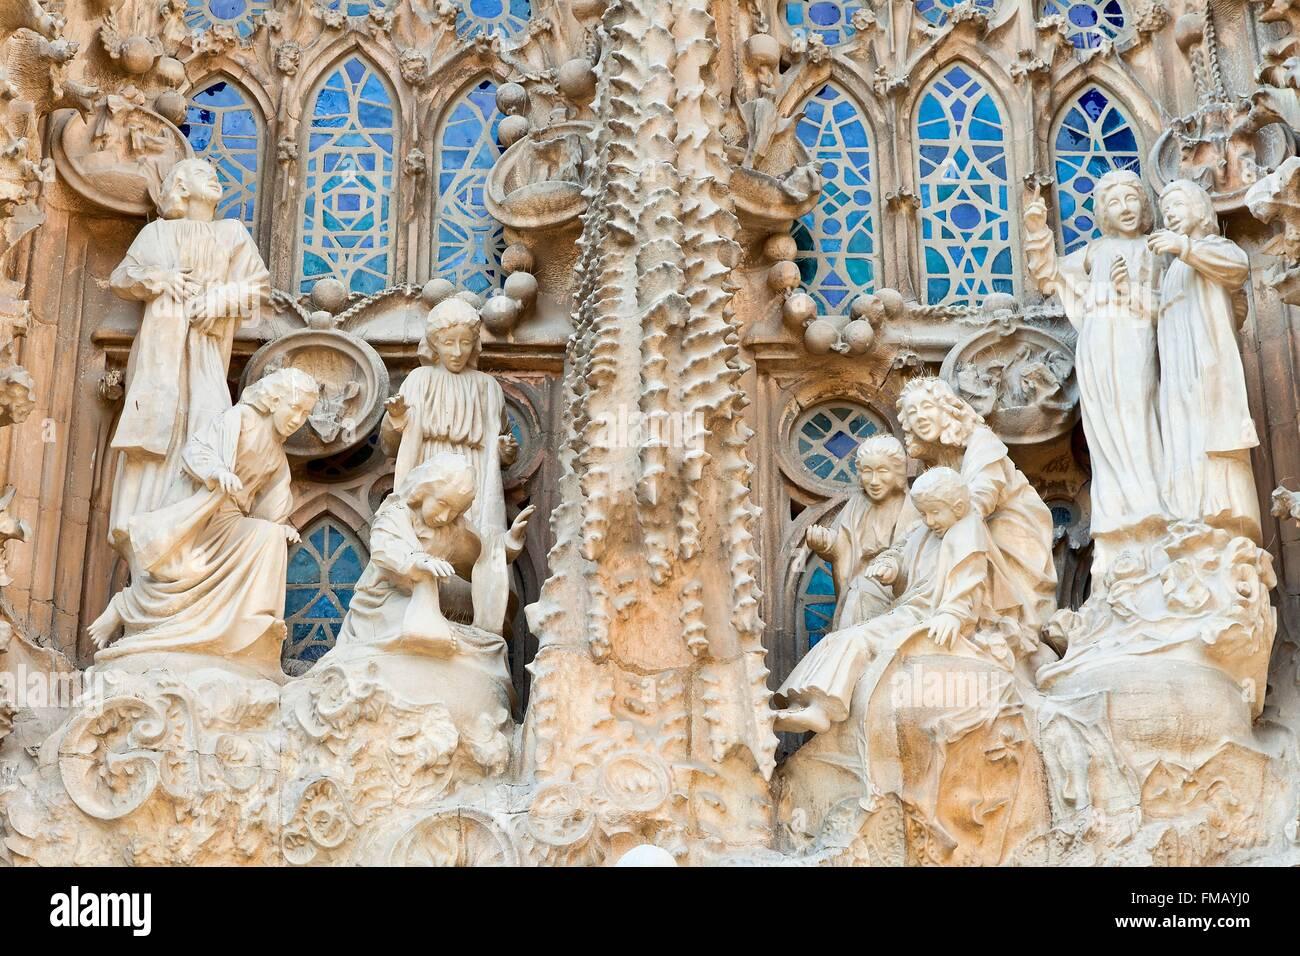 España, Cataluña, Barcelona, la Catedral de la Sagrada Familia listados como Patrimonio Mundial por la UNESCO Foto de stock